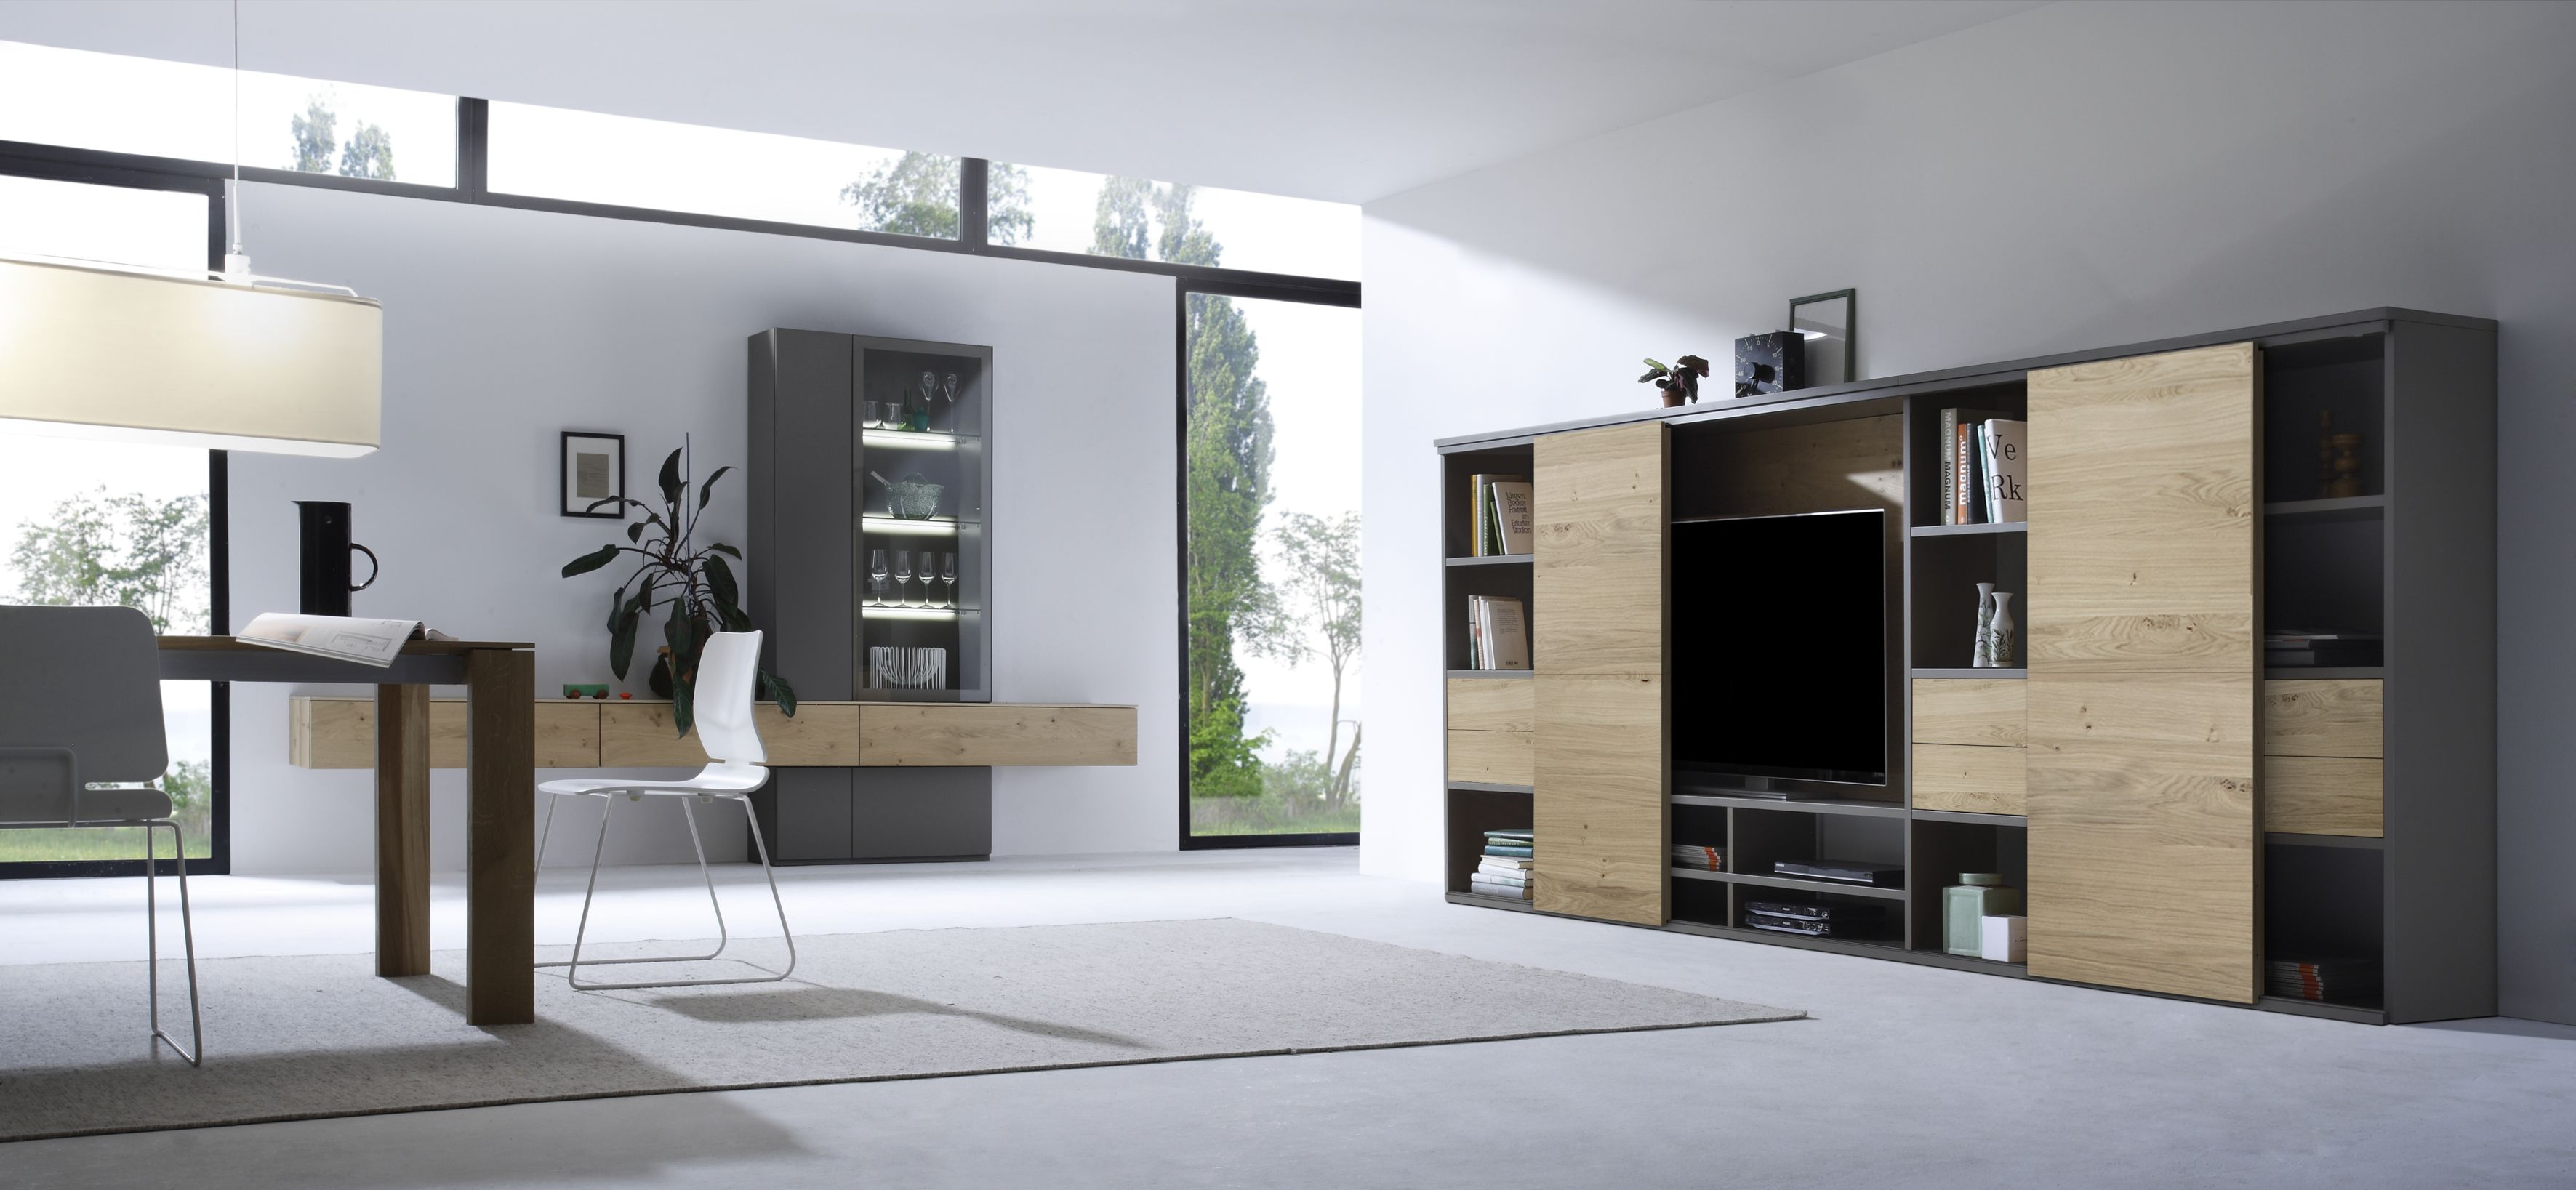 Wohnzimmer: Moebel-Lauxmann.de